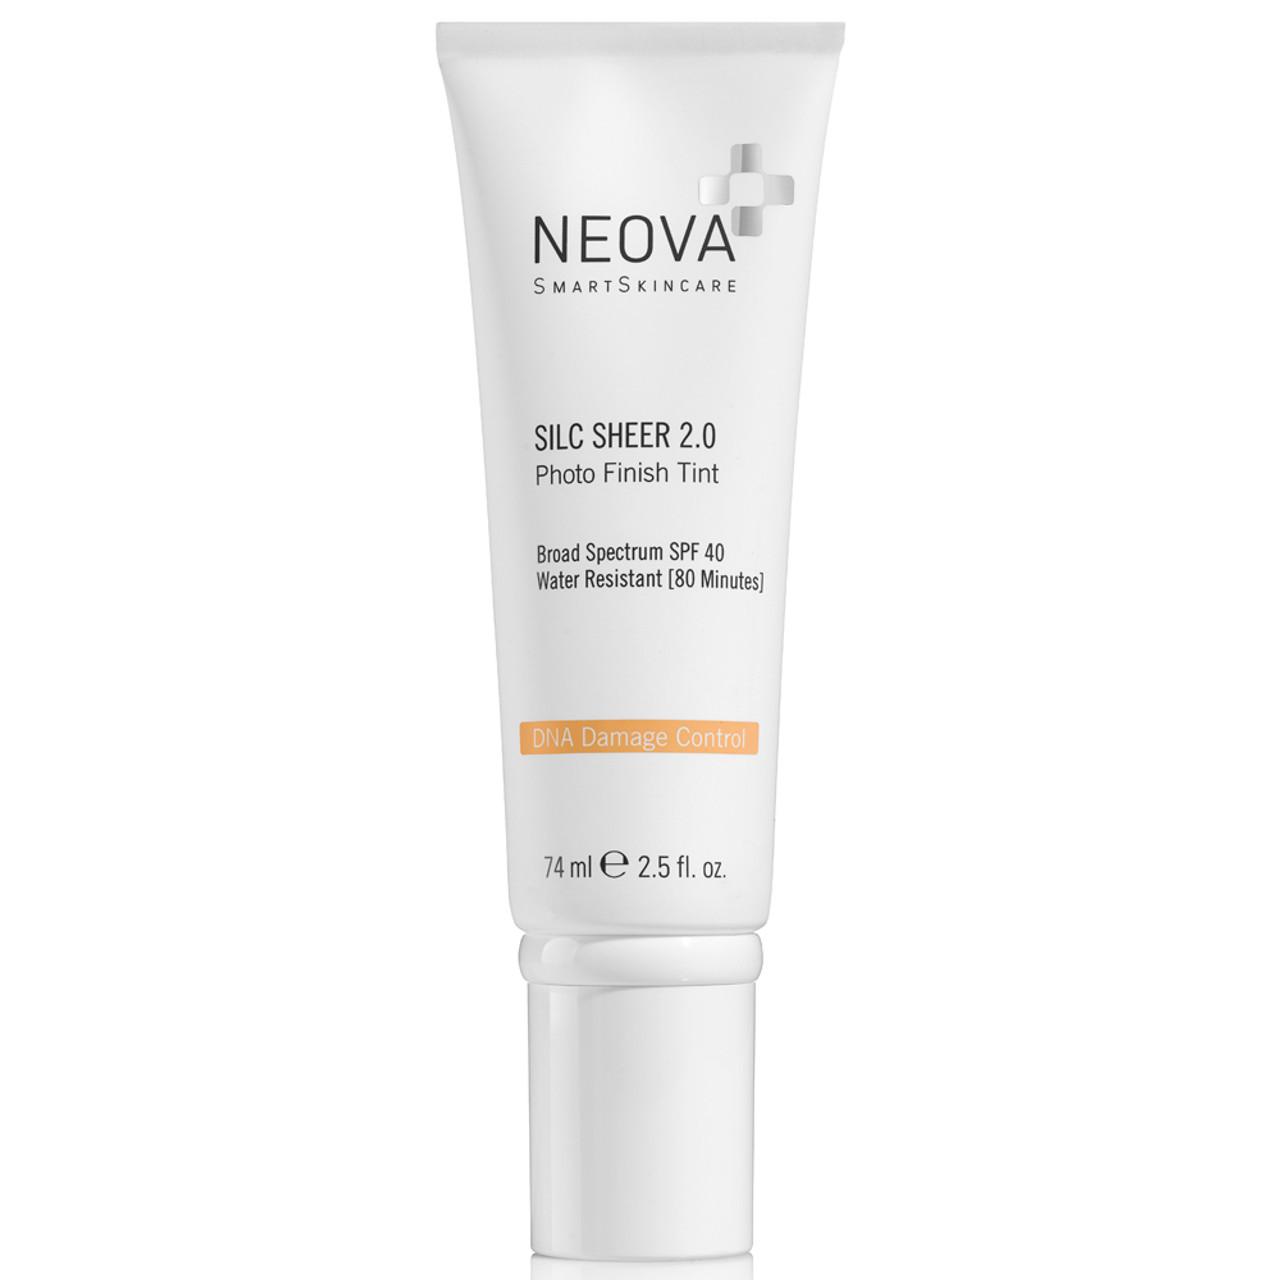 Neova DNA Damage Control Silc Sheer 2.0 [Broad Spectrum SPF 40]